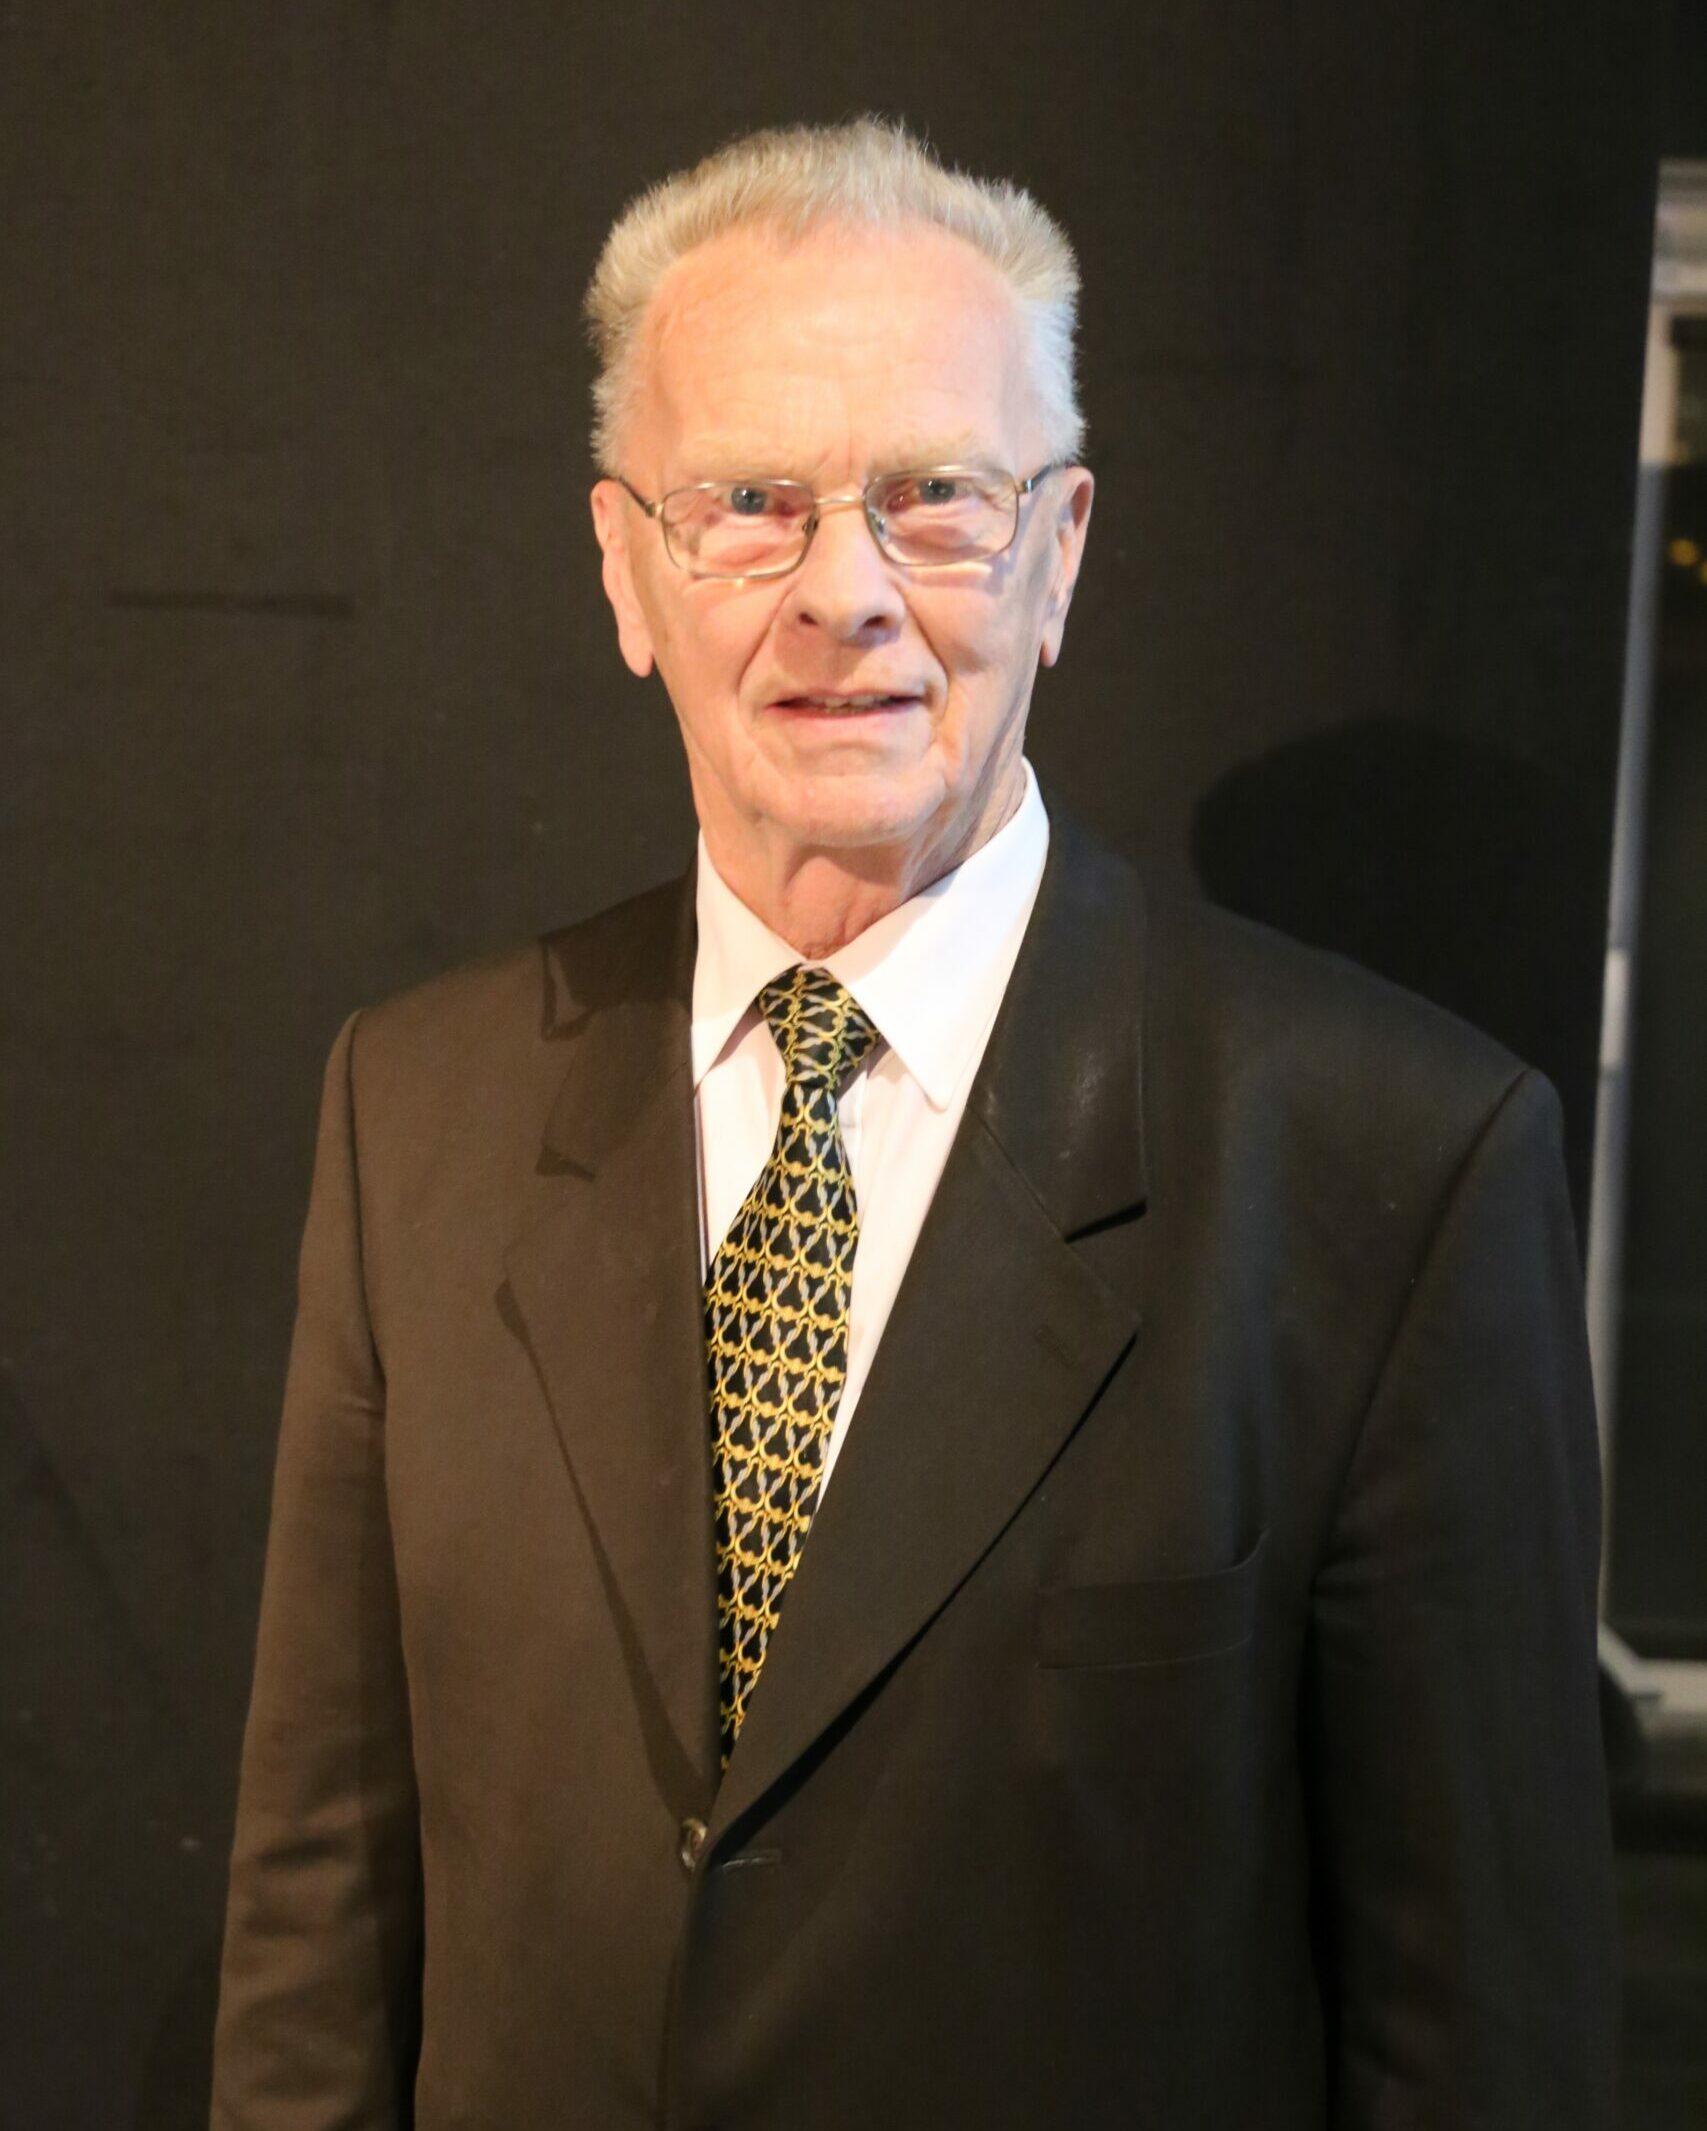 Guðmundur Haraldsson